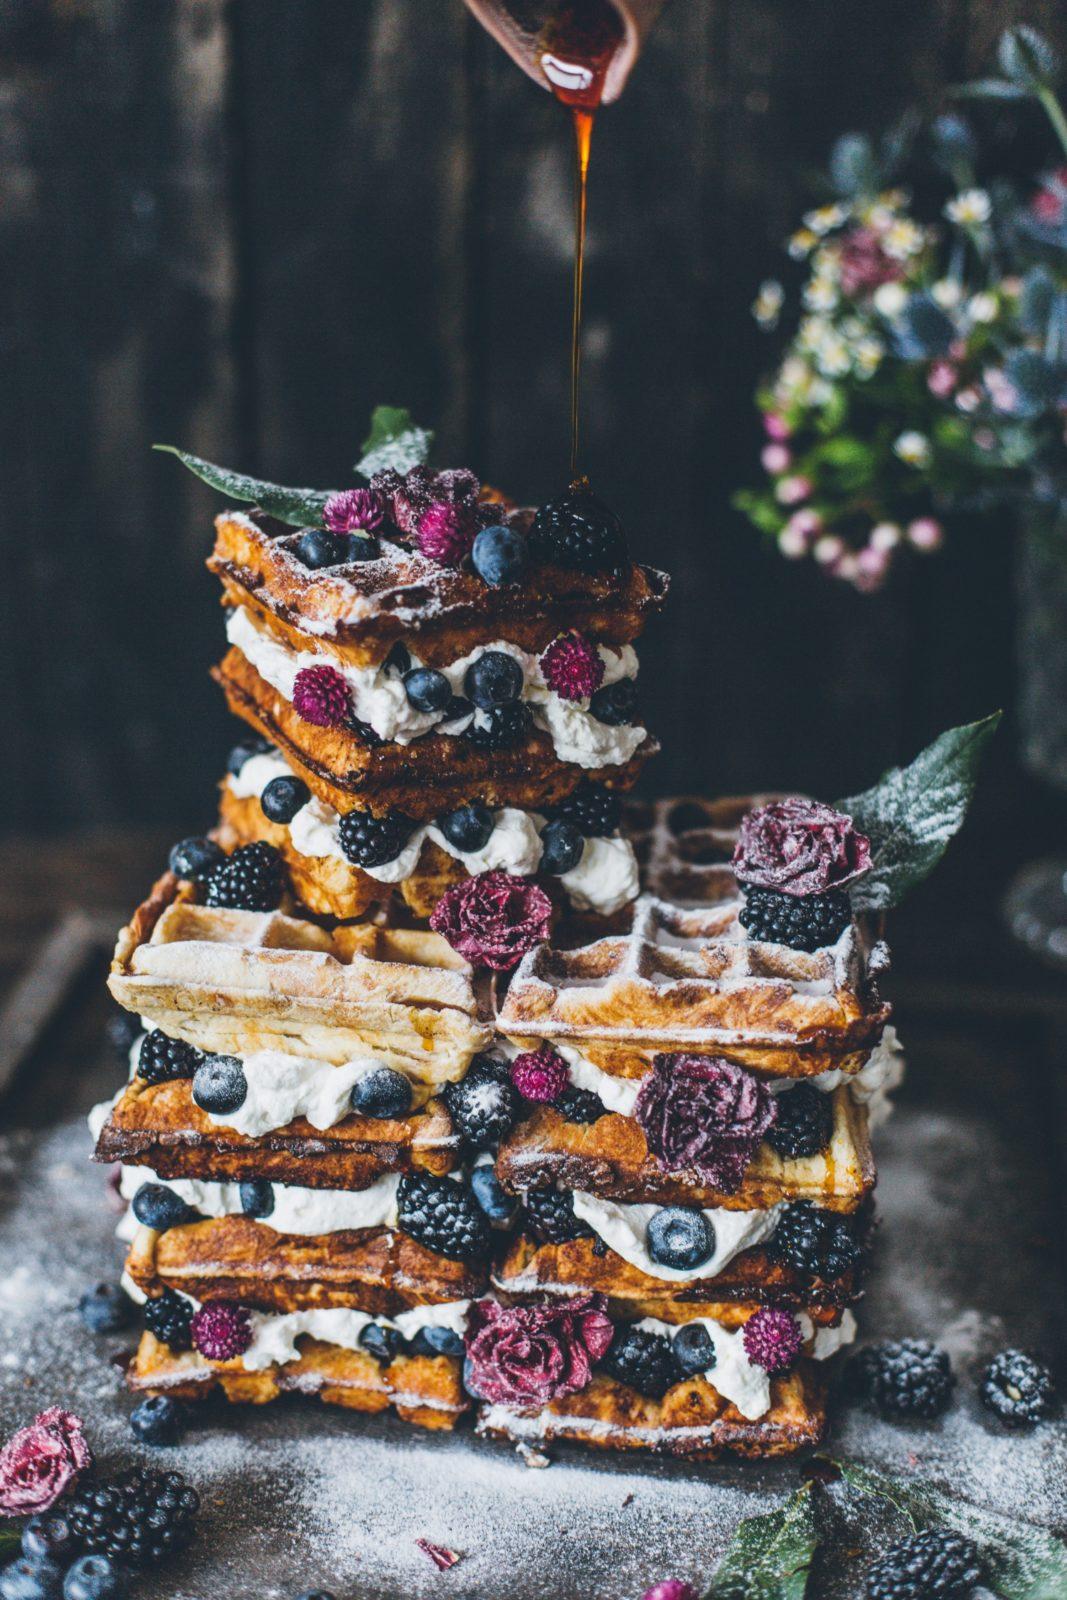 wafflecake_nakedcake- foodstyling_hochzeitstrend_hochzeitstorte